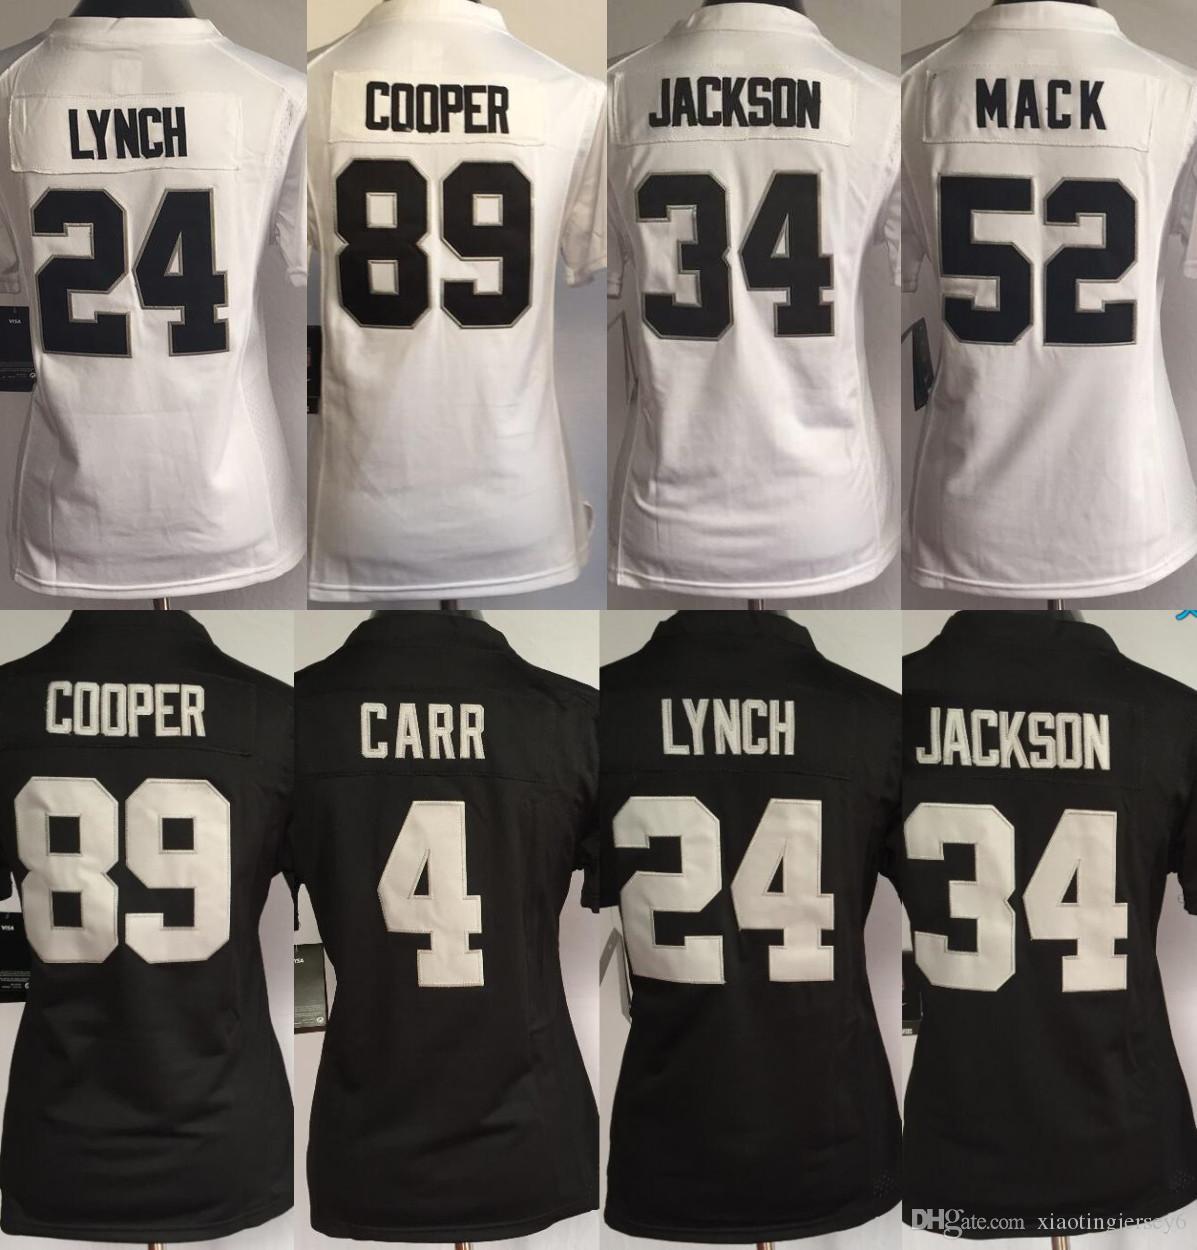 2018 Wholesale Women 24 Marshawn Lynch 4 Derek Carr Jersey Oakland Raider  52 Khalil Mack 34 Bo Jackson 89 Amari Cooper Football Jerseys From  Xiaotingjersey6 ... 0a6fdd03d